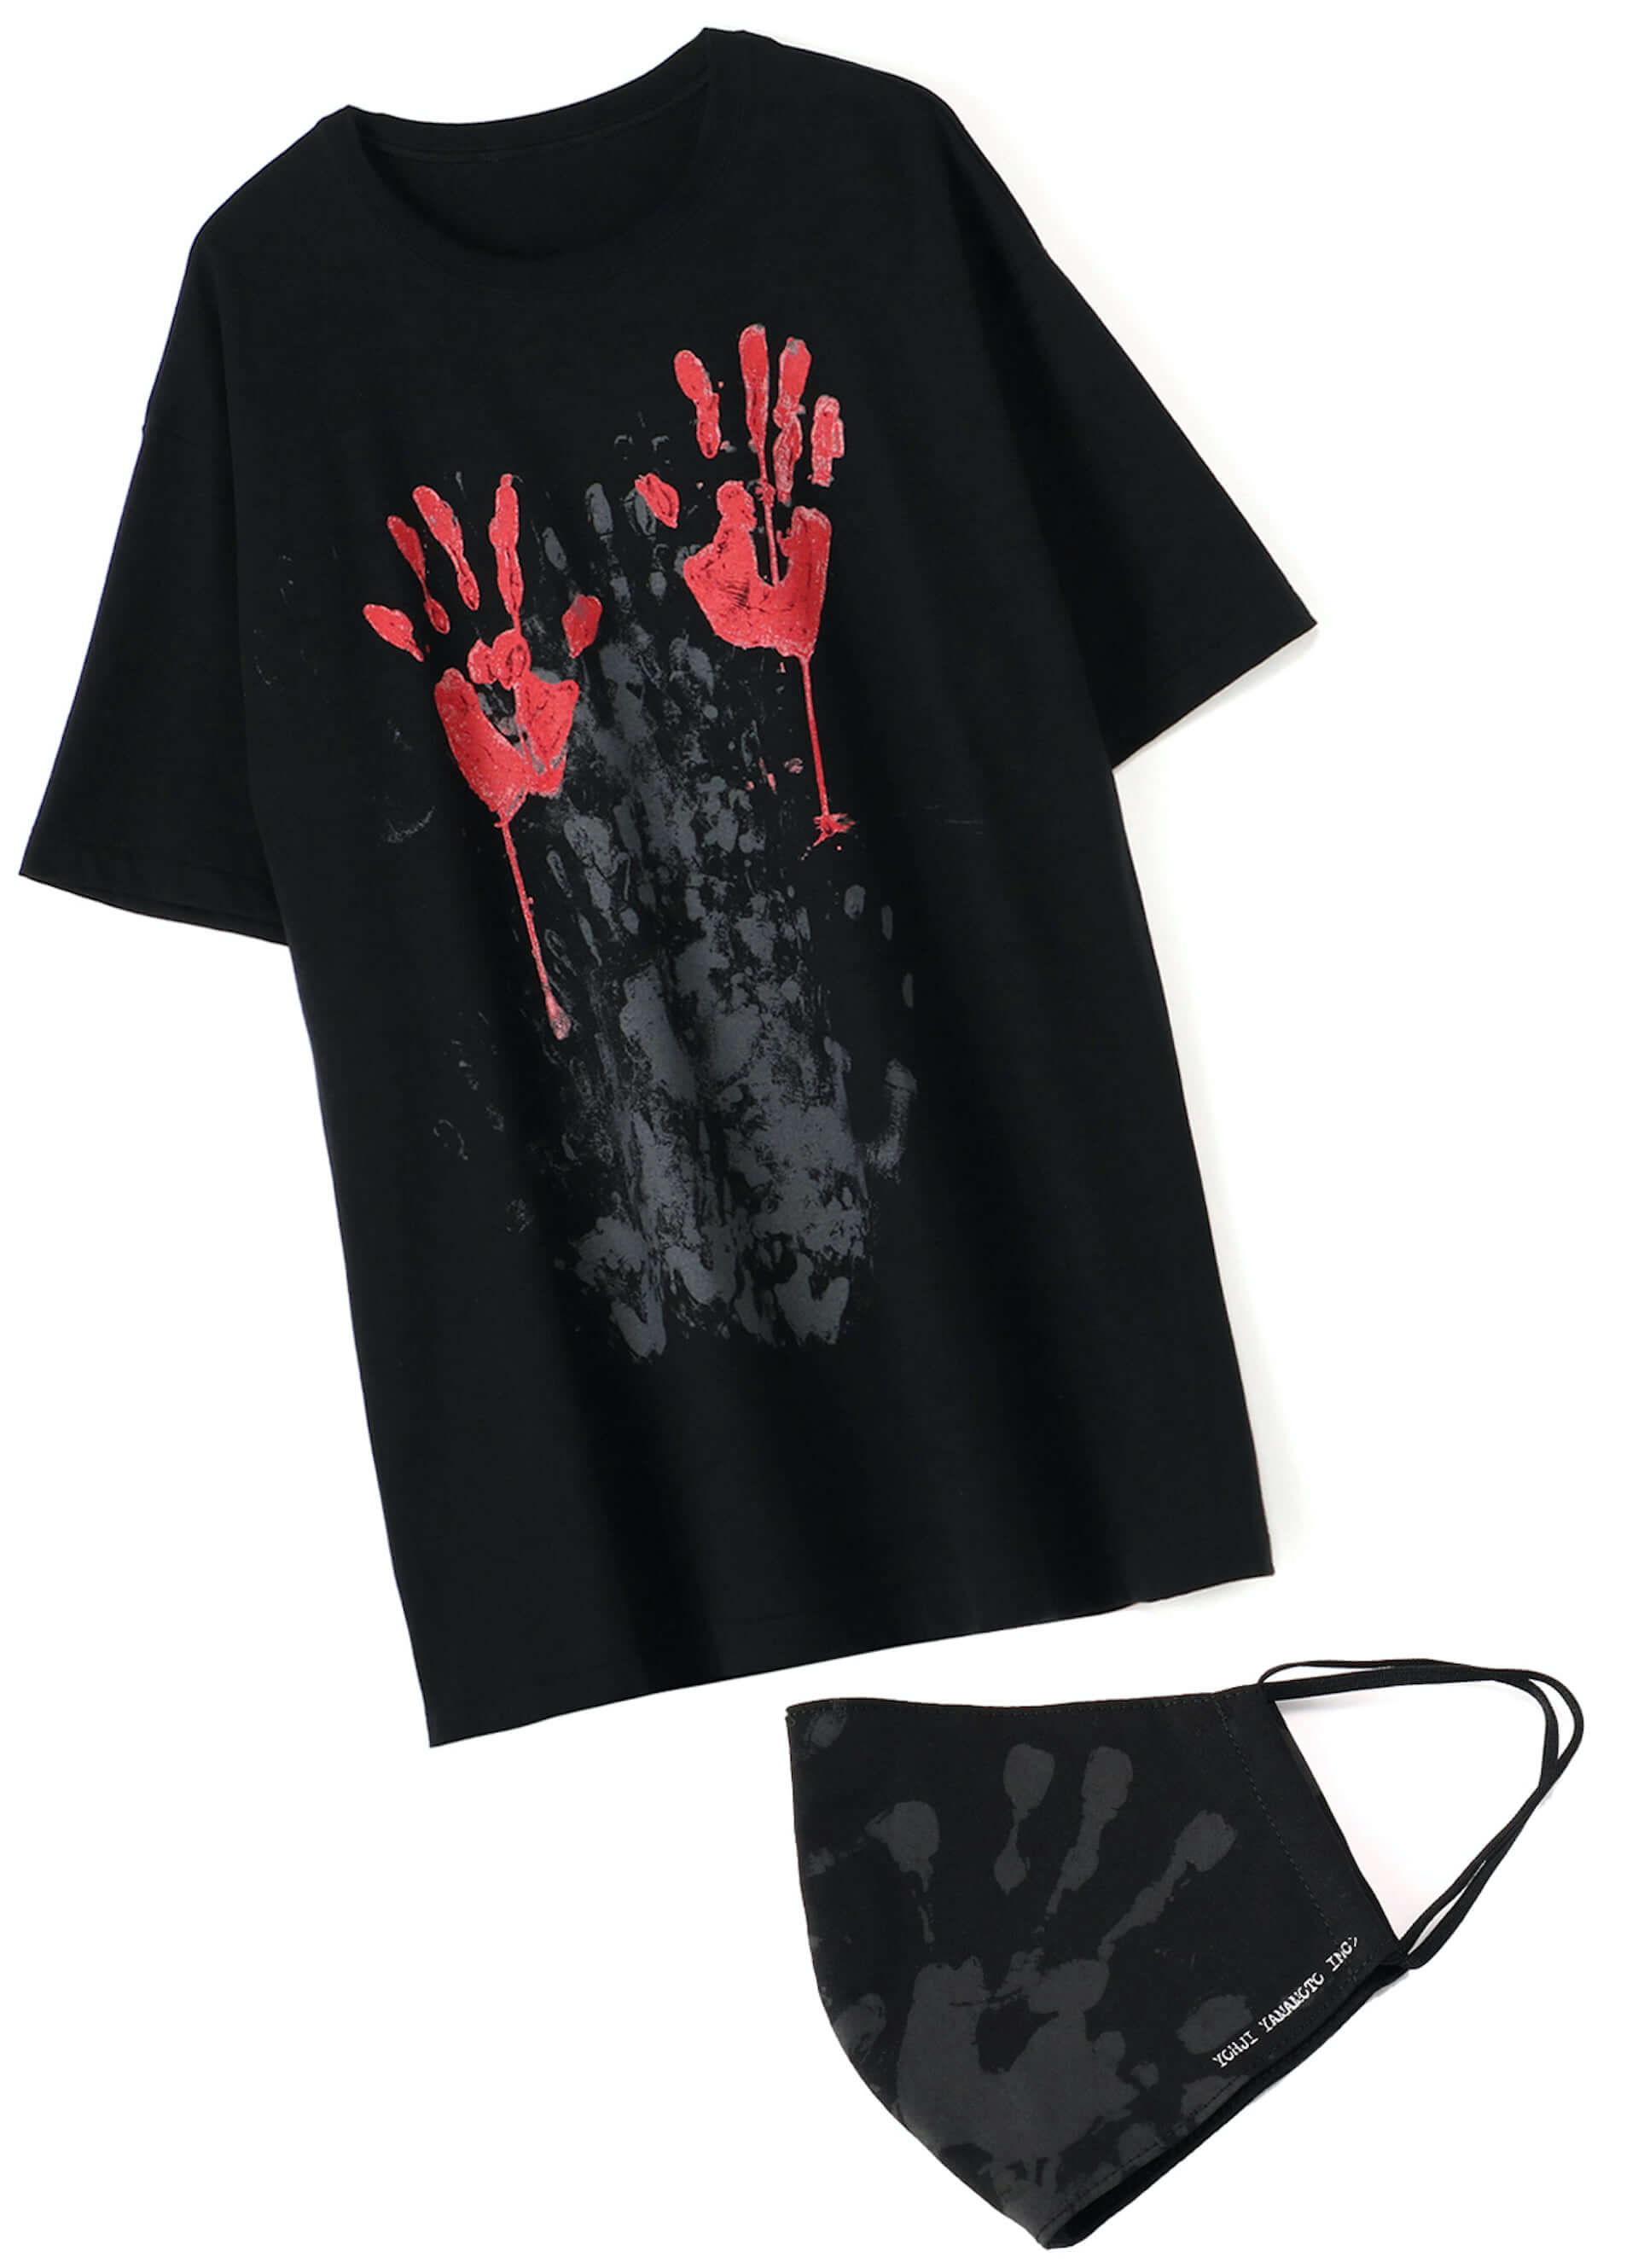 YOHJI YAMAMOTO +NOIRと画家 内田すずめがコラボした「Tシャツ+マスク」が限定販売!鳩や手の平のモチーフ3型 lf200604_yohjiyamamoto_03-1920x2658